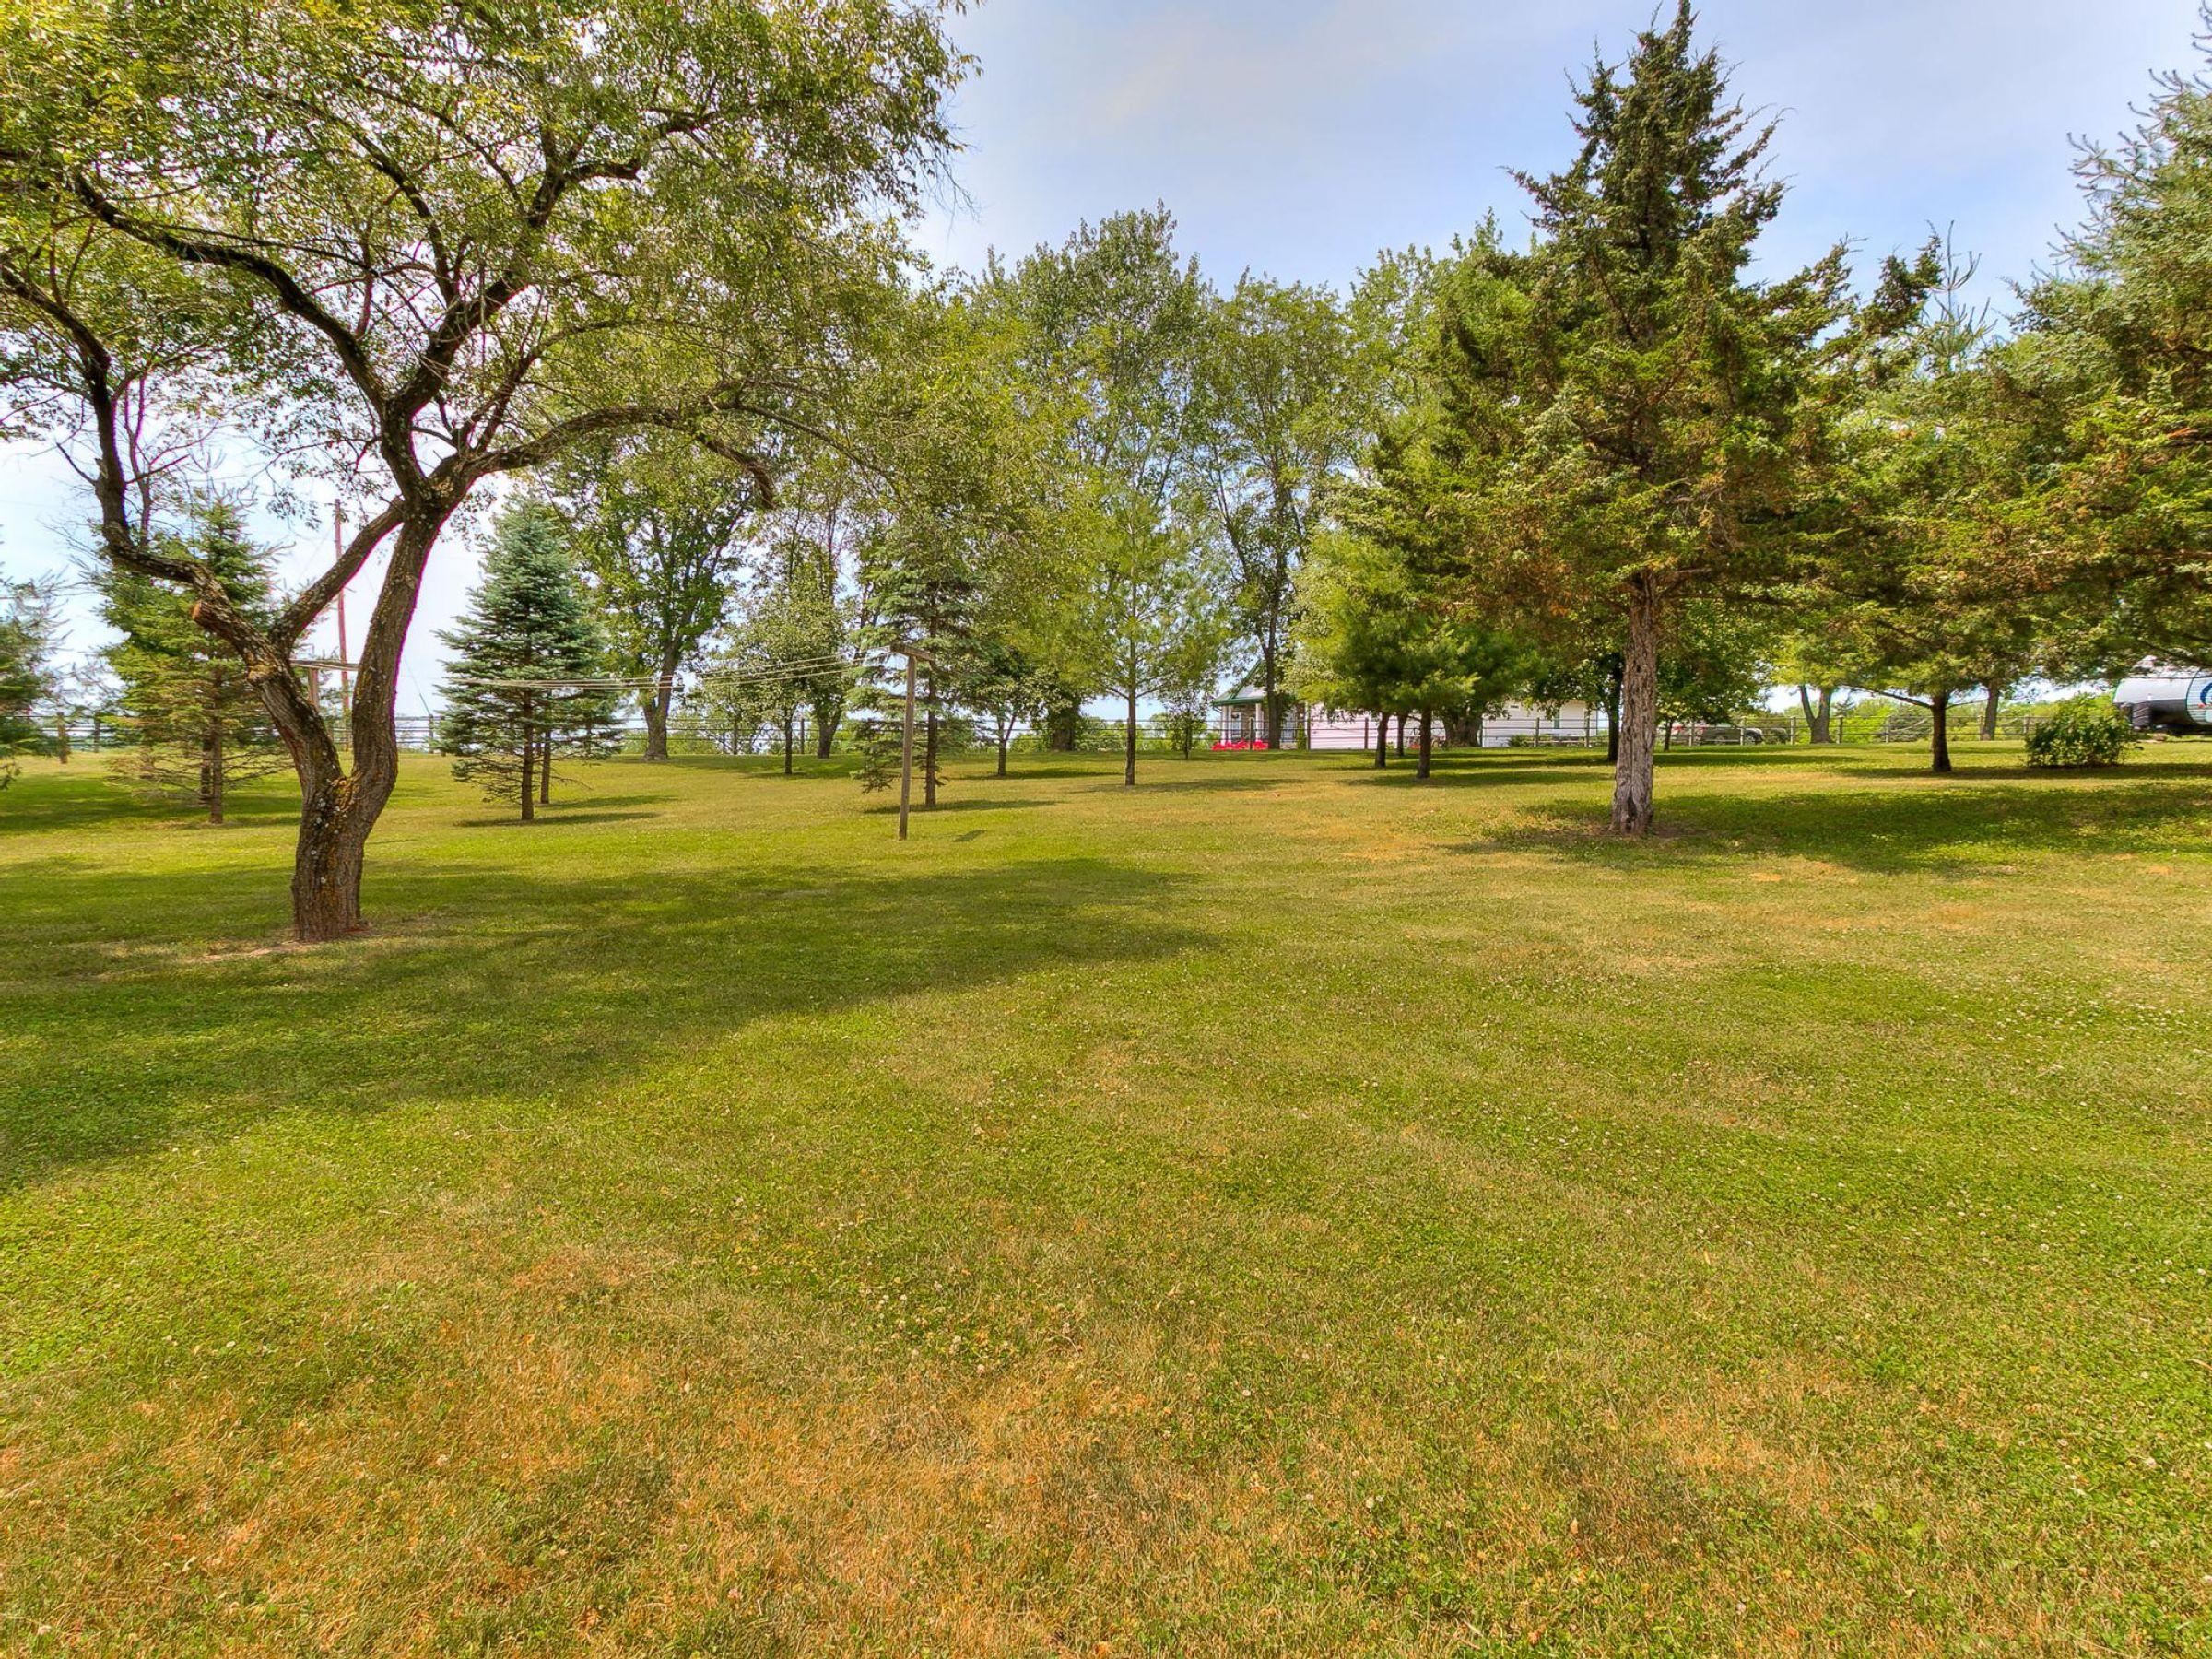 residential-warren-county-iowa-3-acres-listing-number-15593-2-2021-06-18-154700.jpg